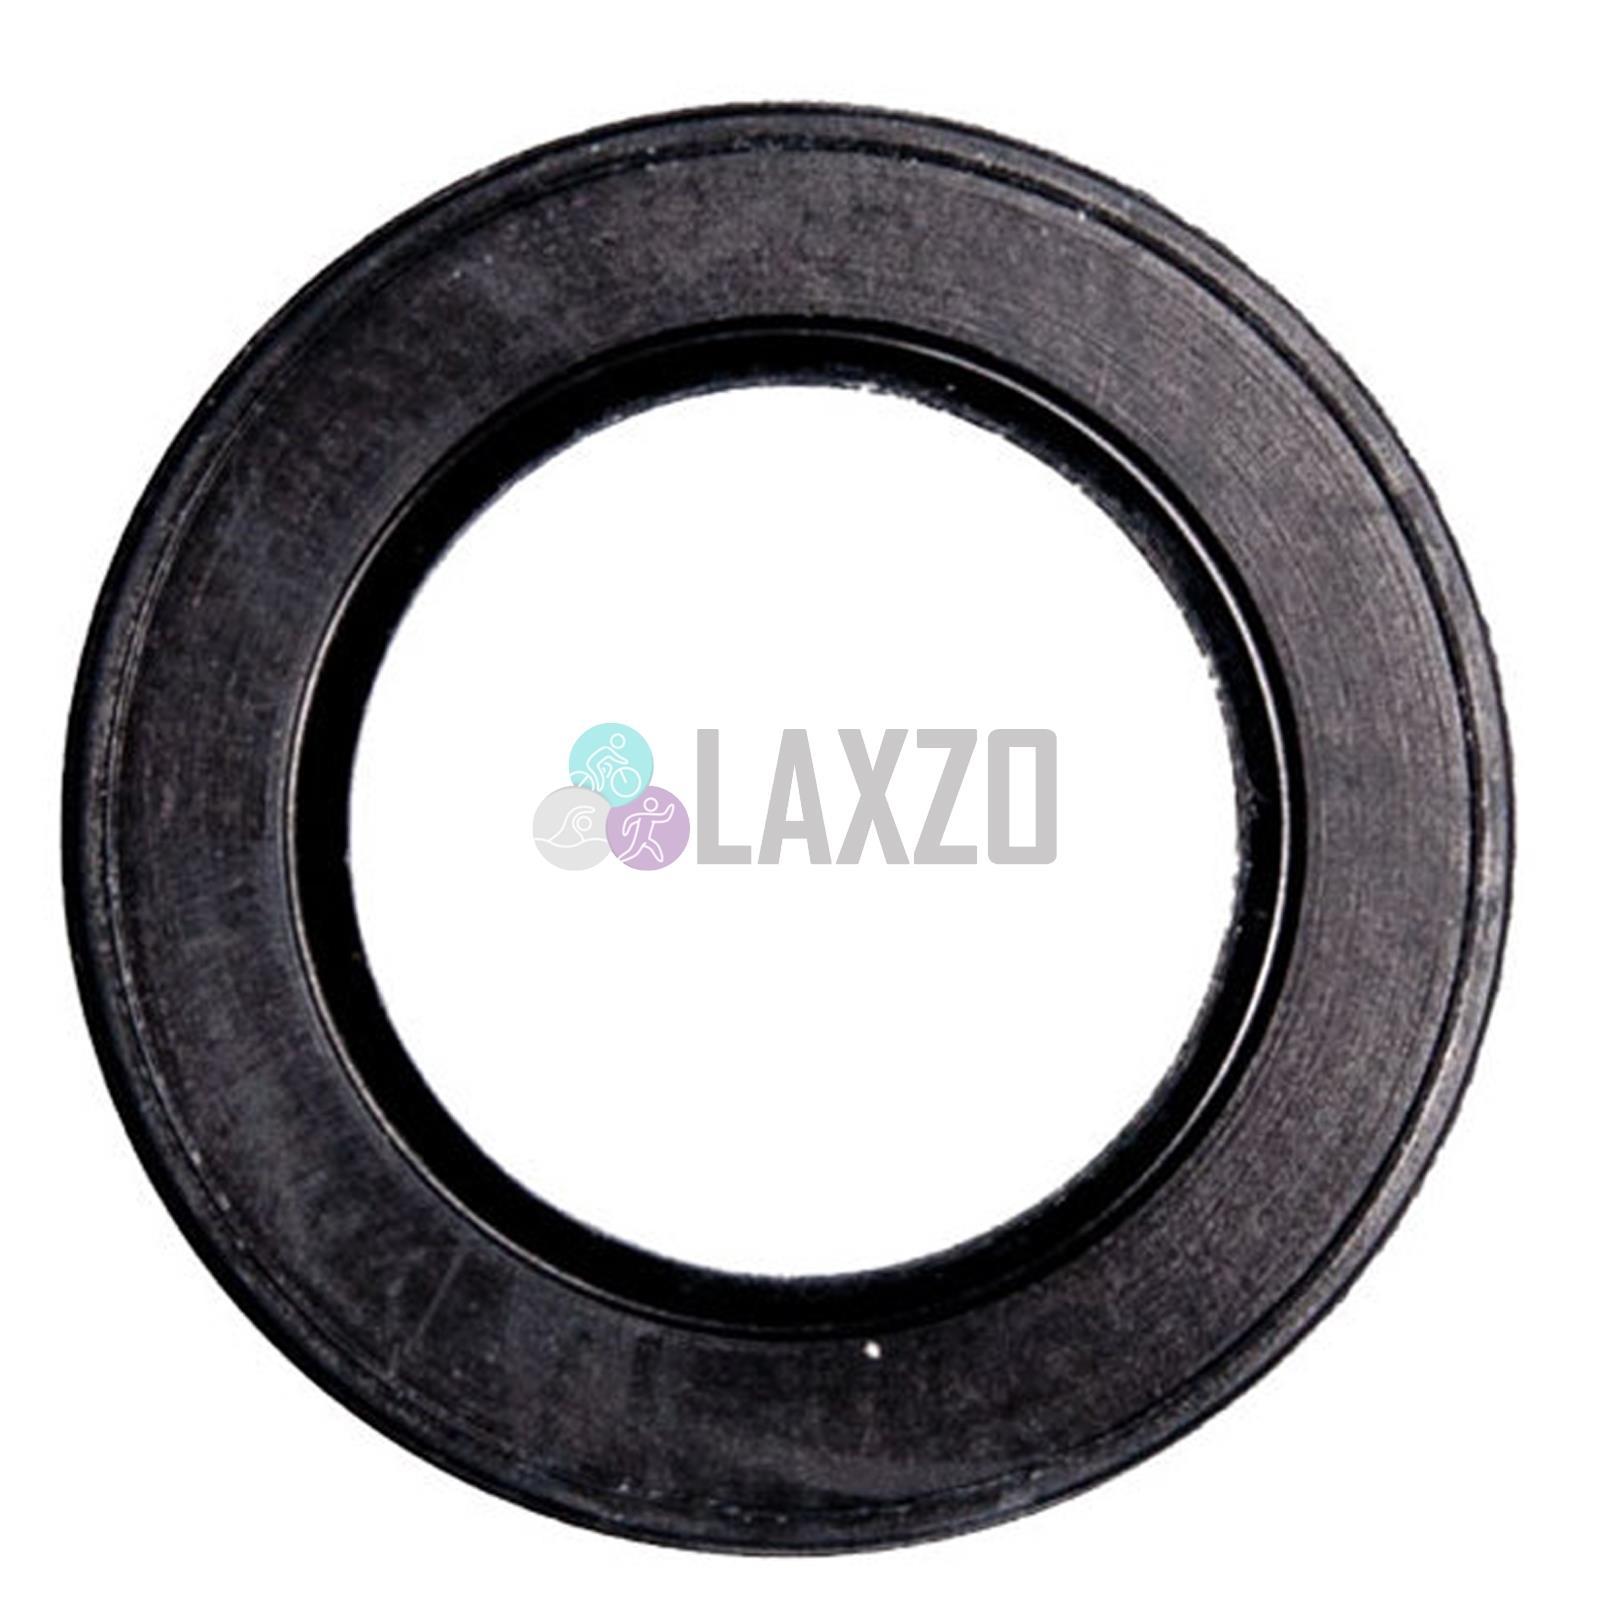 1x Shimano Rear Hub Freehub Seal Ring Black Dust Cover Deore XT XTR Dura Ace